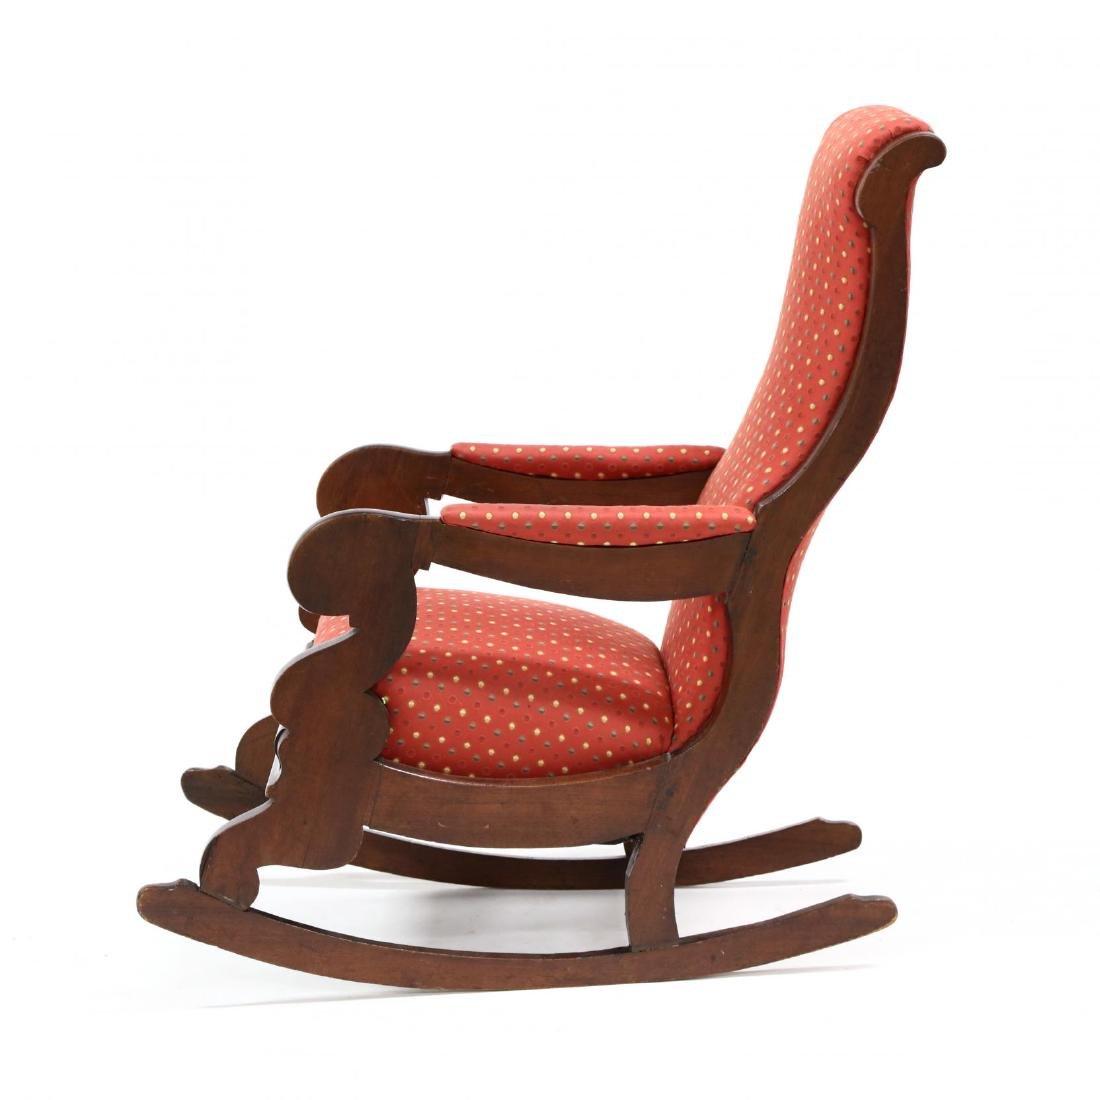 att. Thomas Day, American Classical Rocking Chair - 3